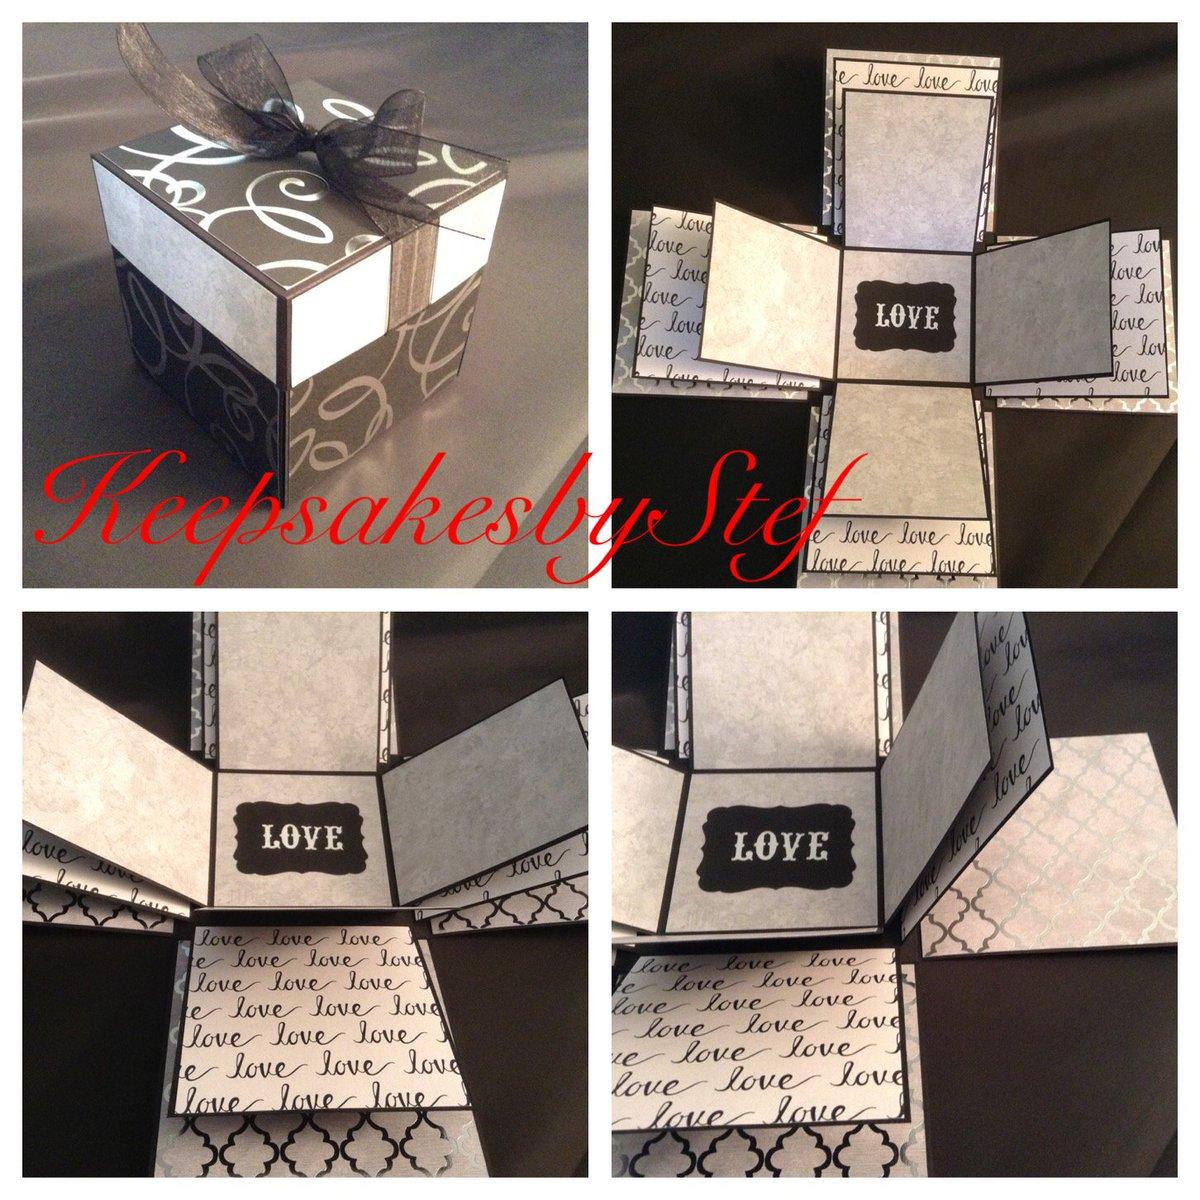 Great gift idea - Love Explosion Box   https://www. etsy.com/listing/507024 181/love-explosion-box-photo-album-box-black?ref=shop_home_active_25 &nbsp; …   #handmade #giftideas #etsymntt<br>http://pic.twitter.com/SHj2pHPb7z